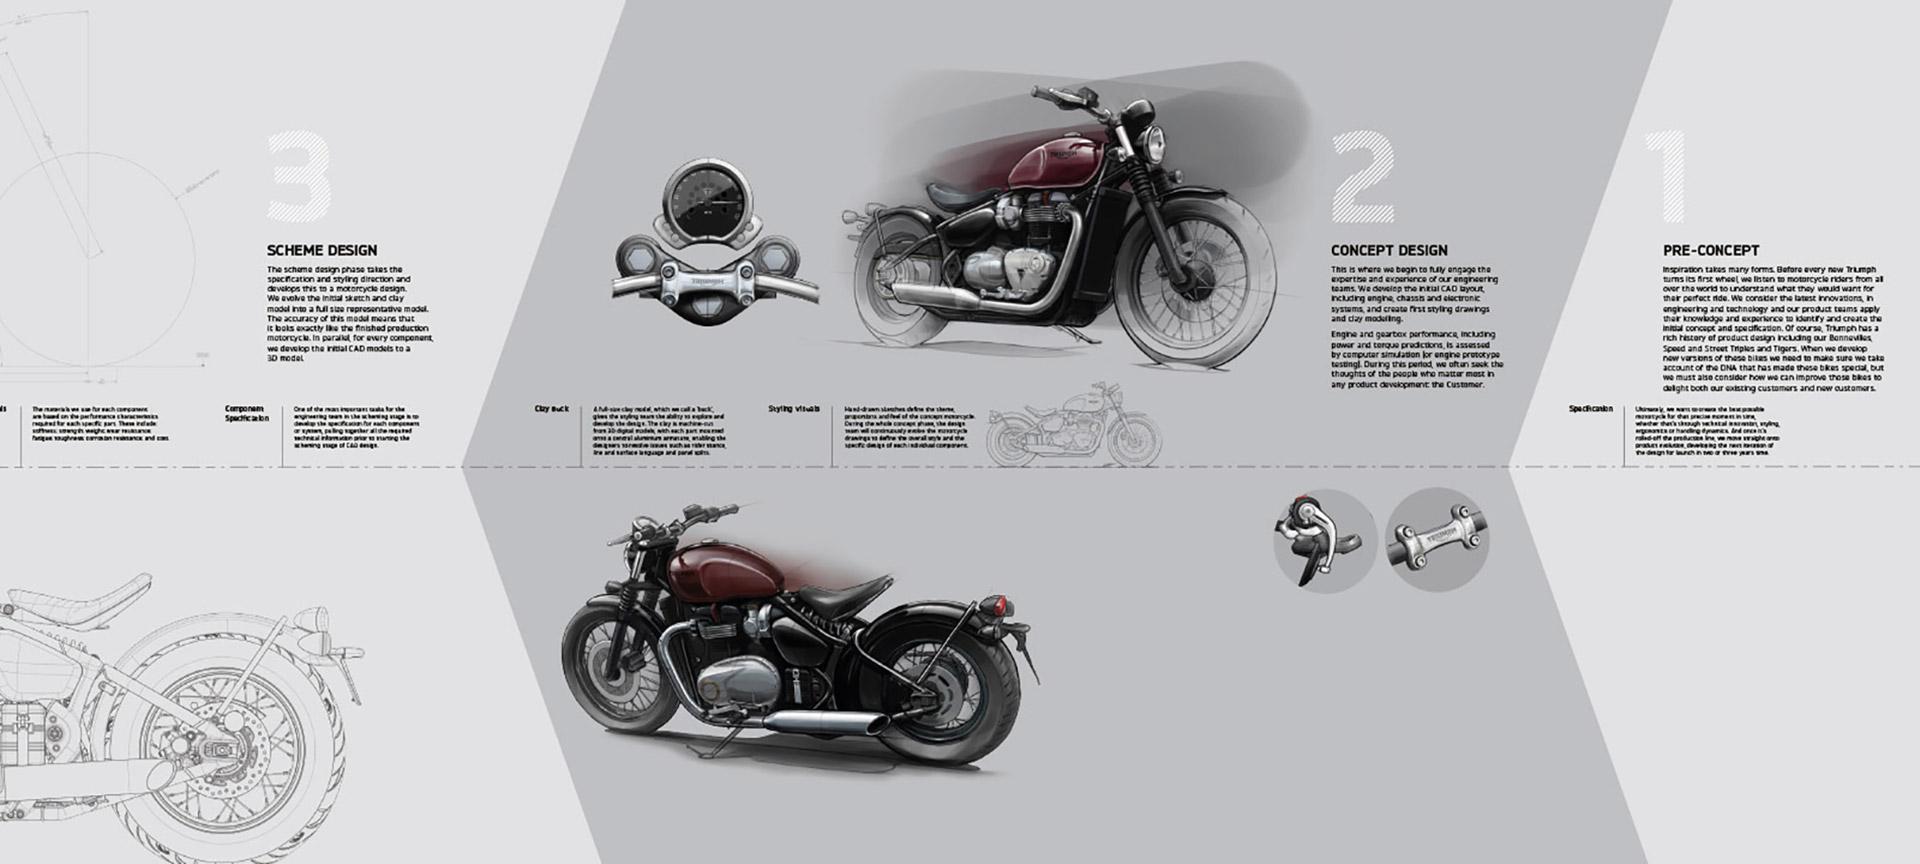 Triumph Graphic Image